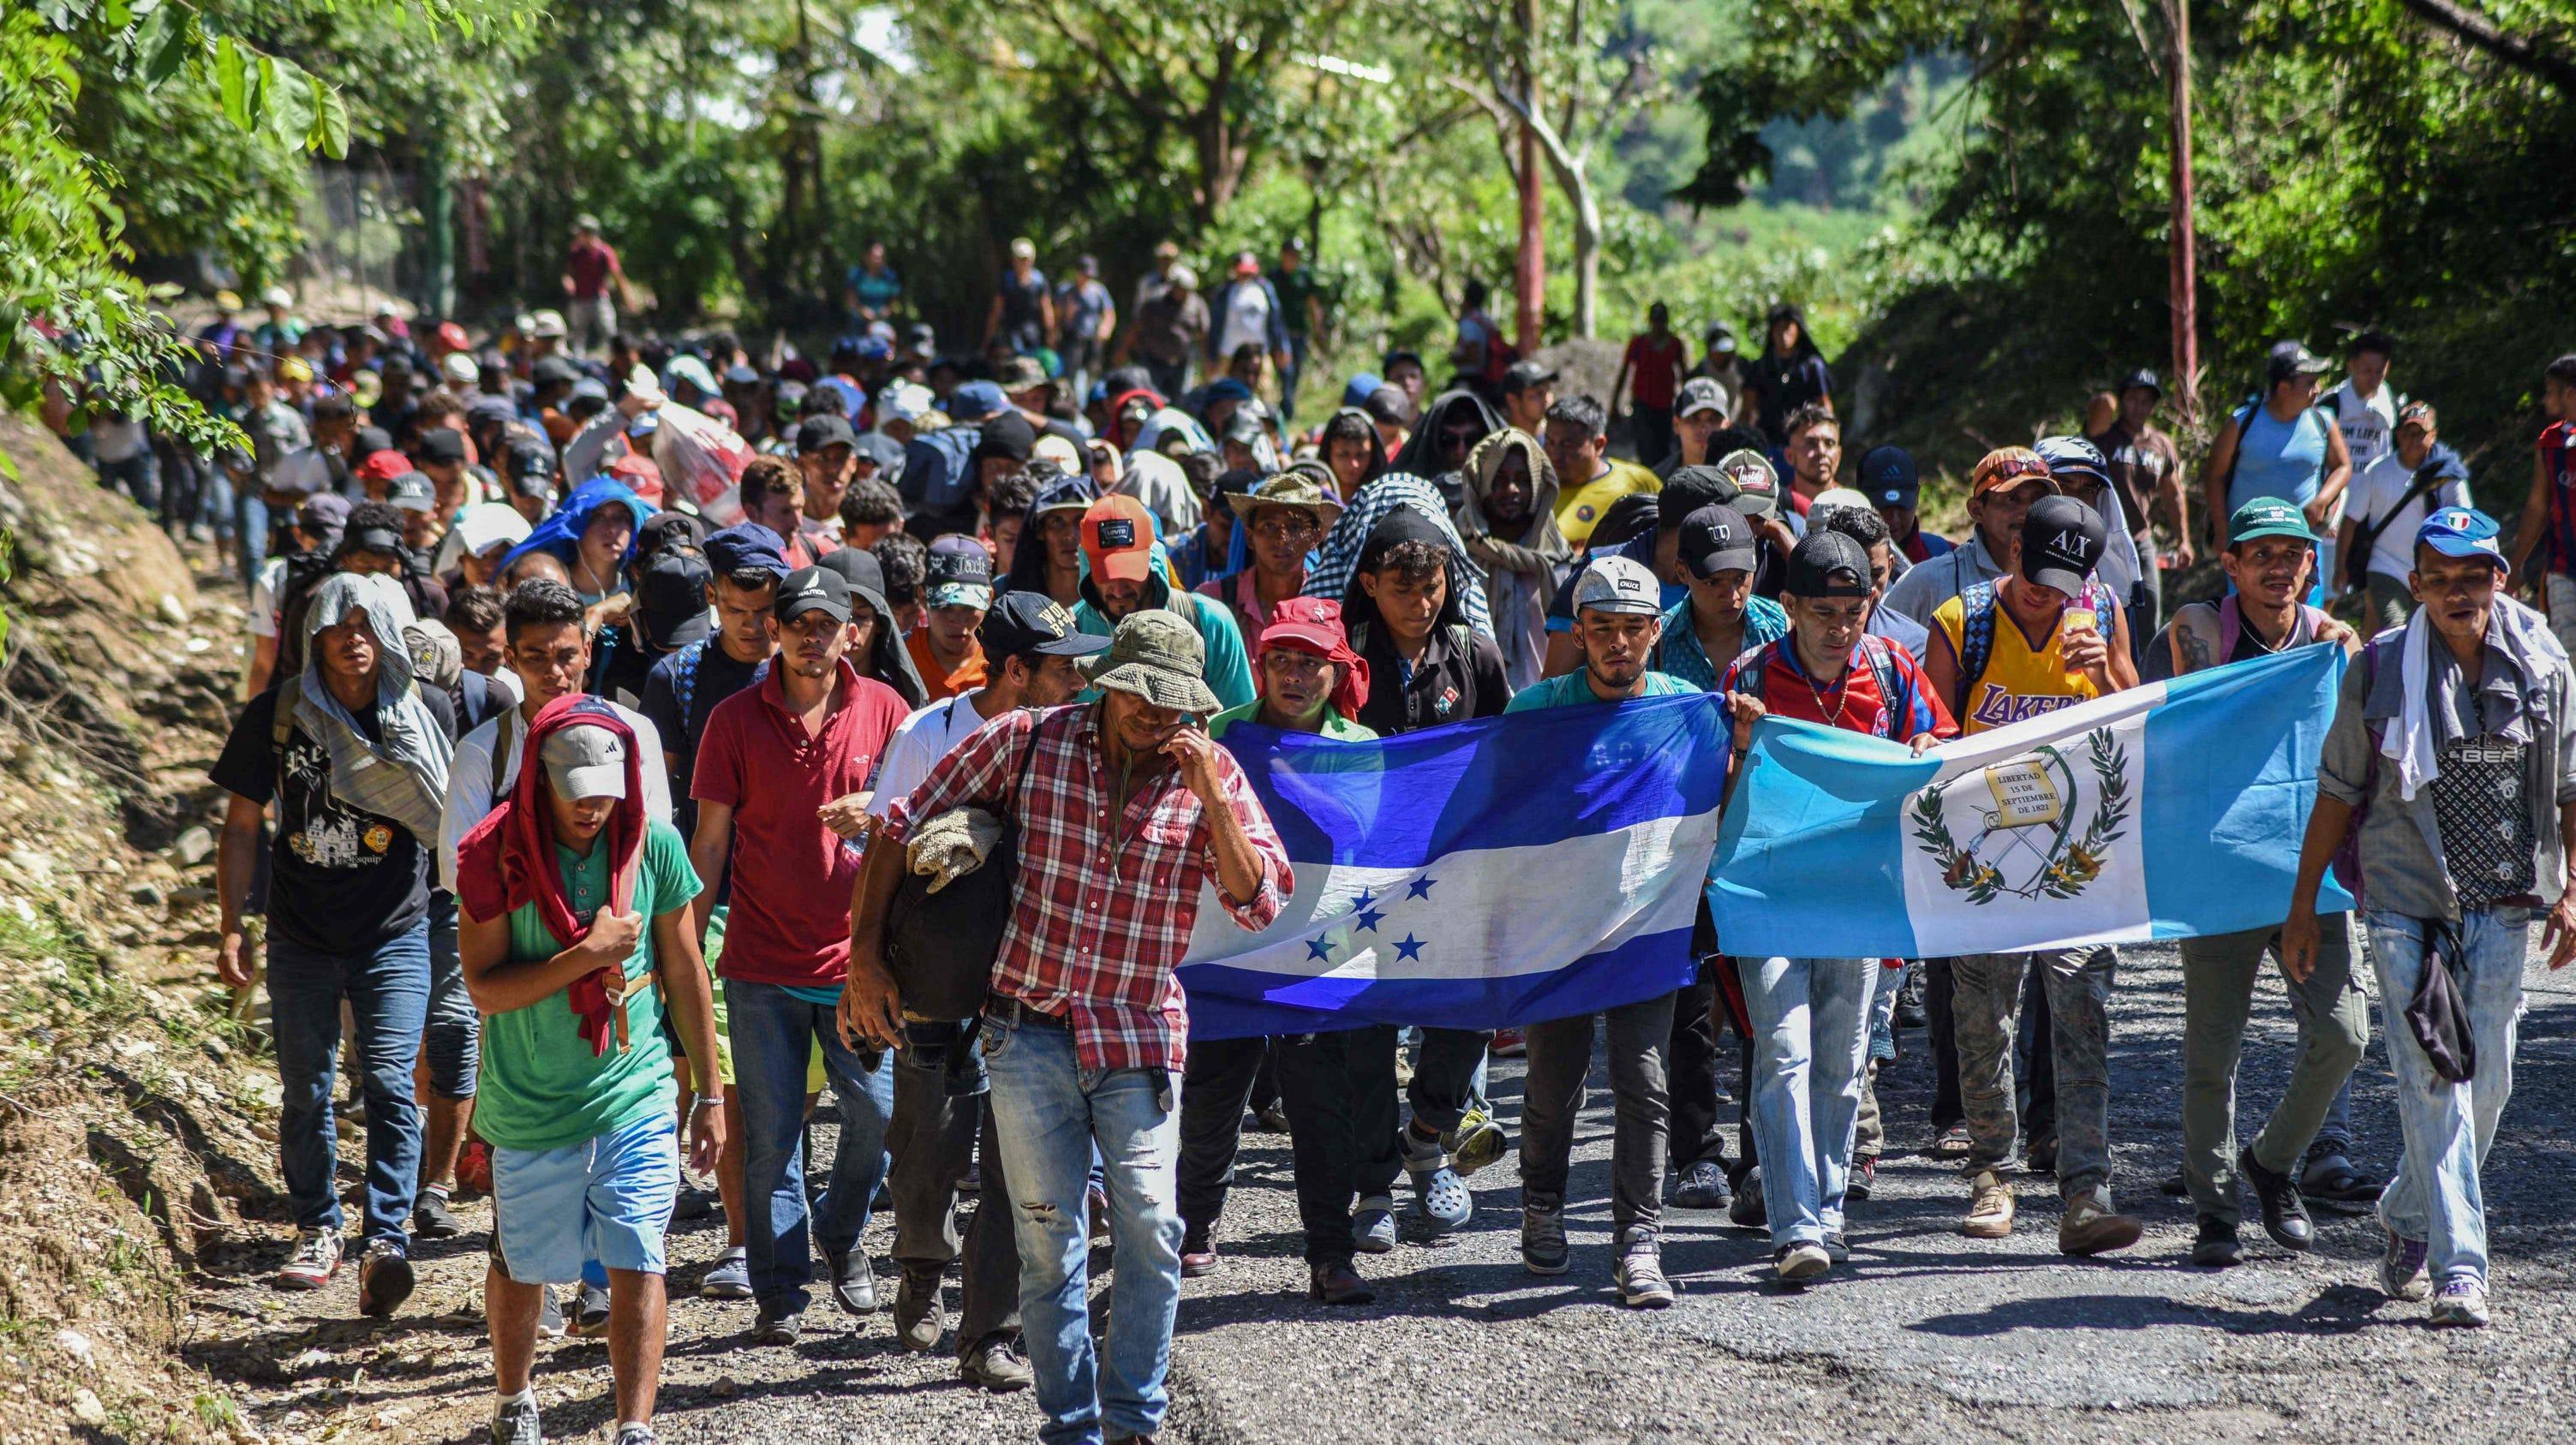 Image result for migrant caravan, waving flags, photos